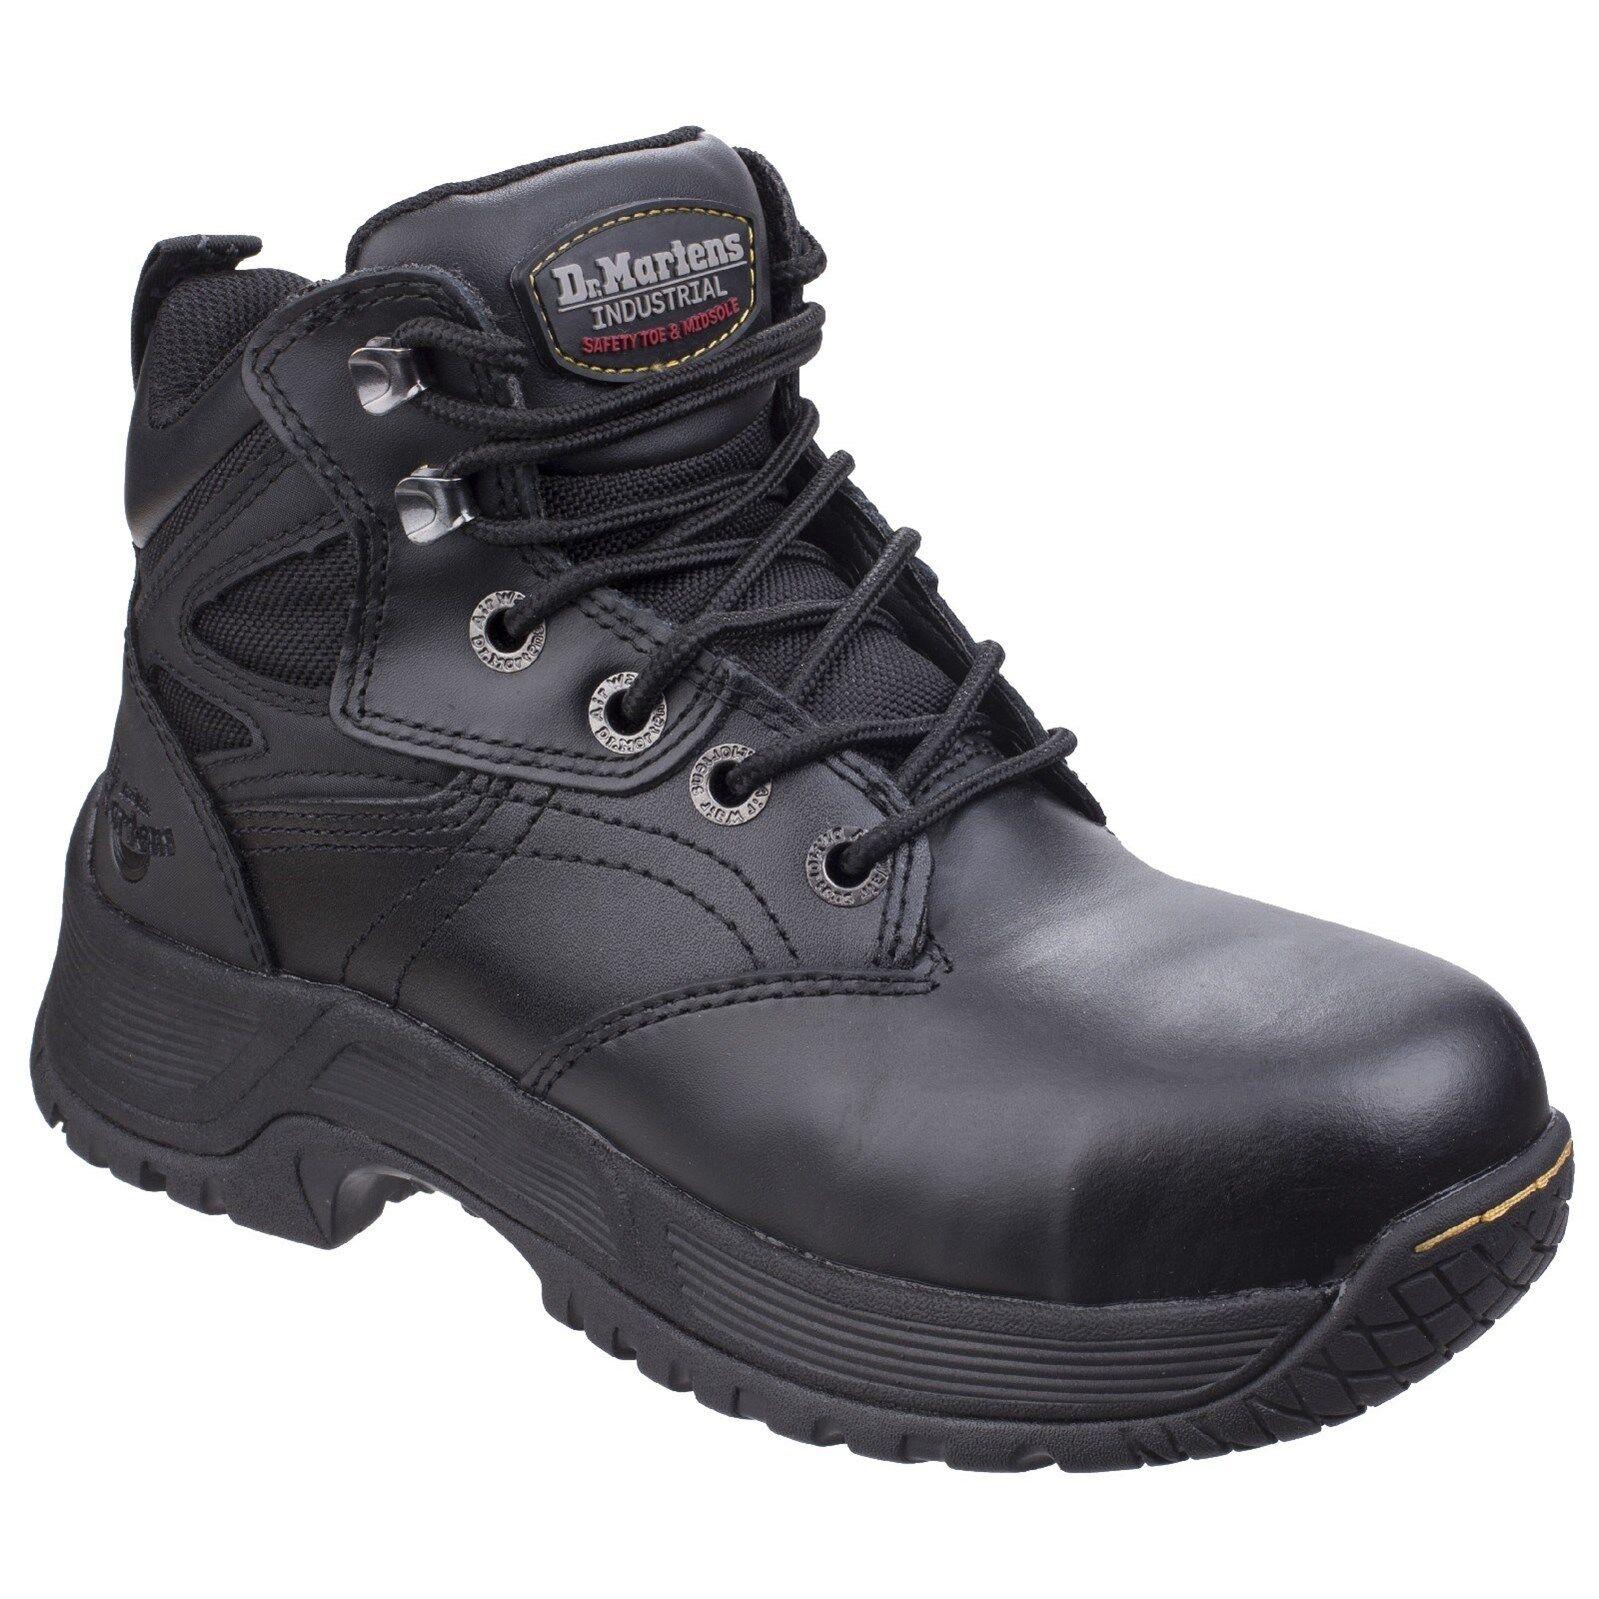 Hombre Dr Martens Torness st Negro Senderista botas de Seguridad Gb Tallas 3 -13